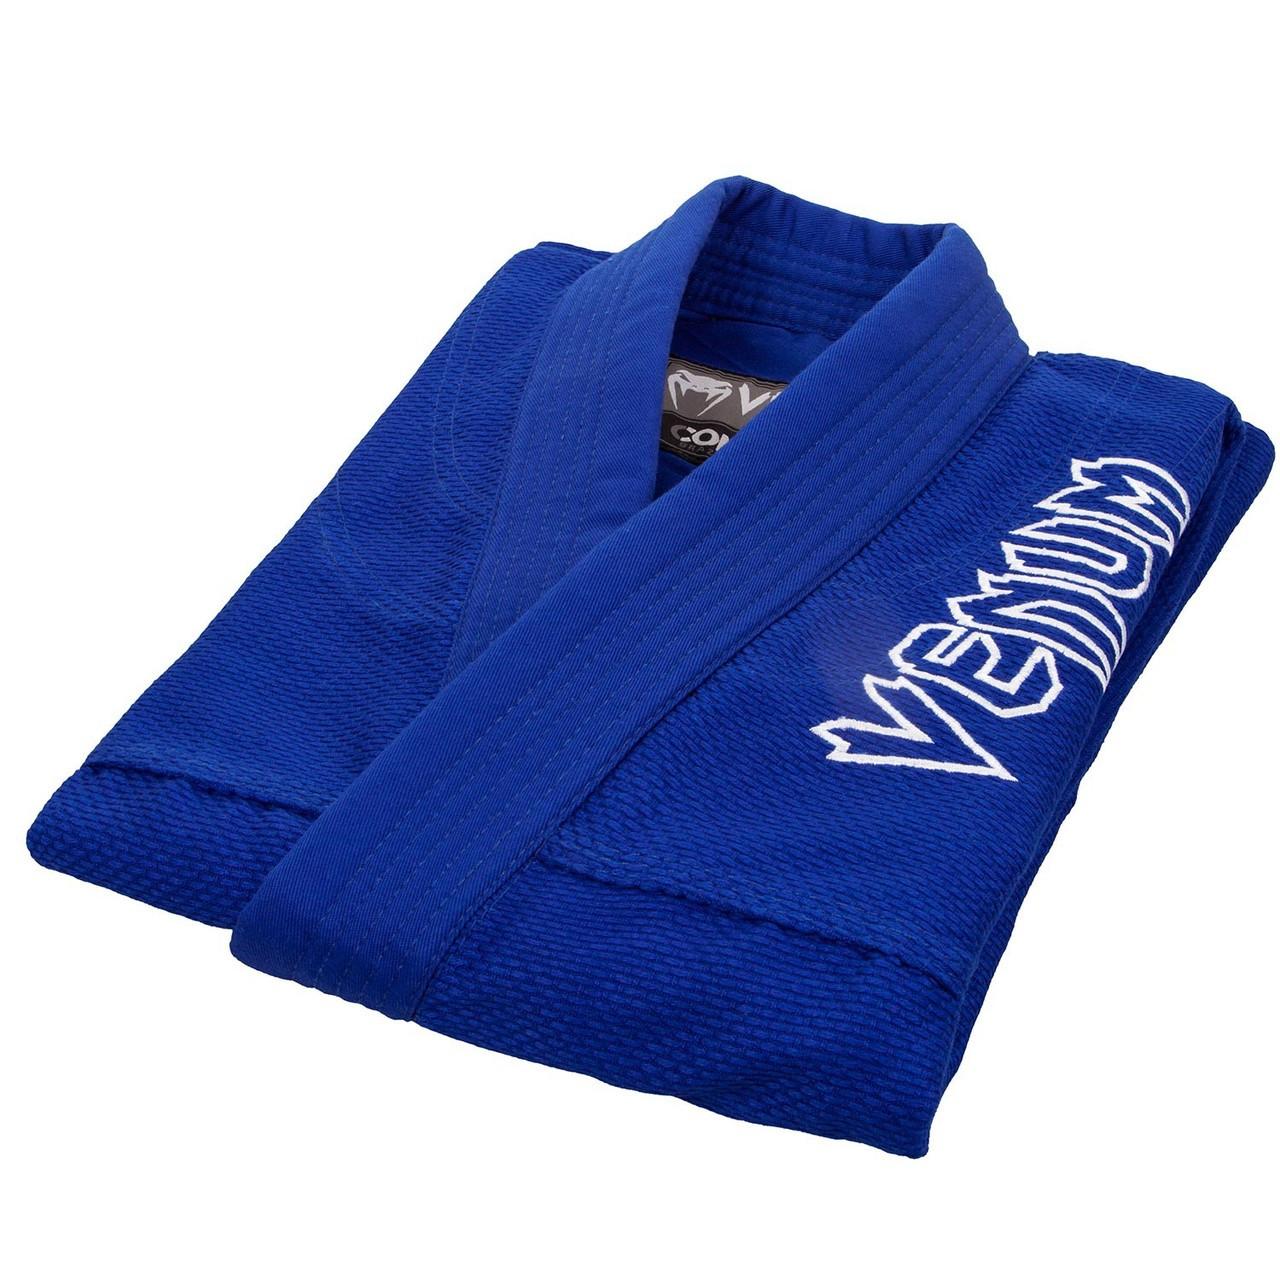 Gi top only Venum Contender 2.0 Blue BJJ GI available at www.thejiujitsushop.com  Enjoy Free Shipping from The Jiu Jitsu Shop today!